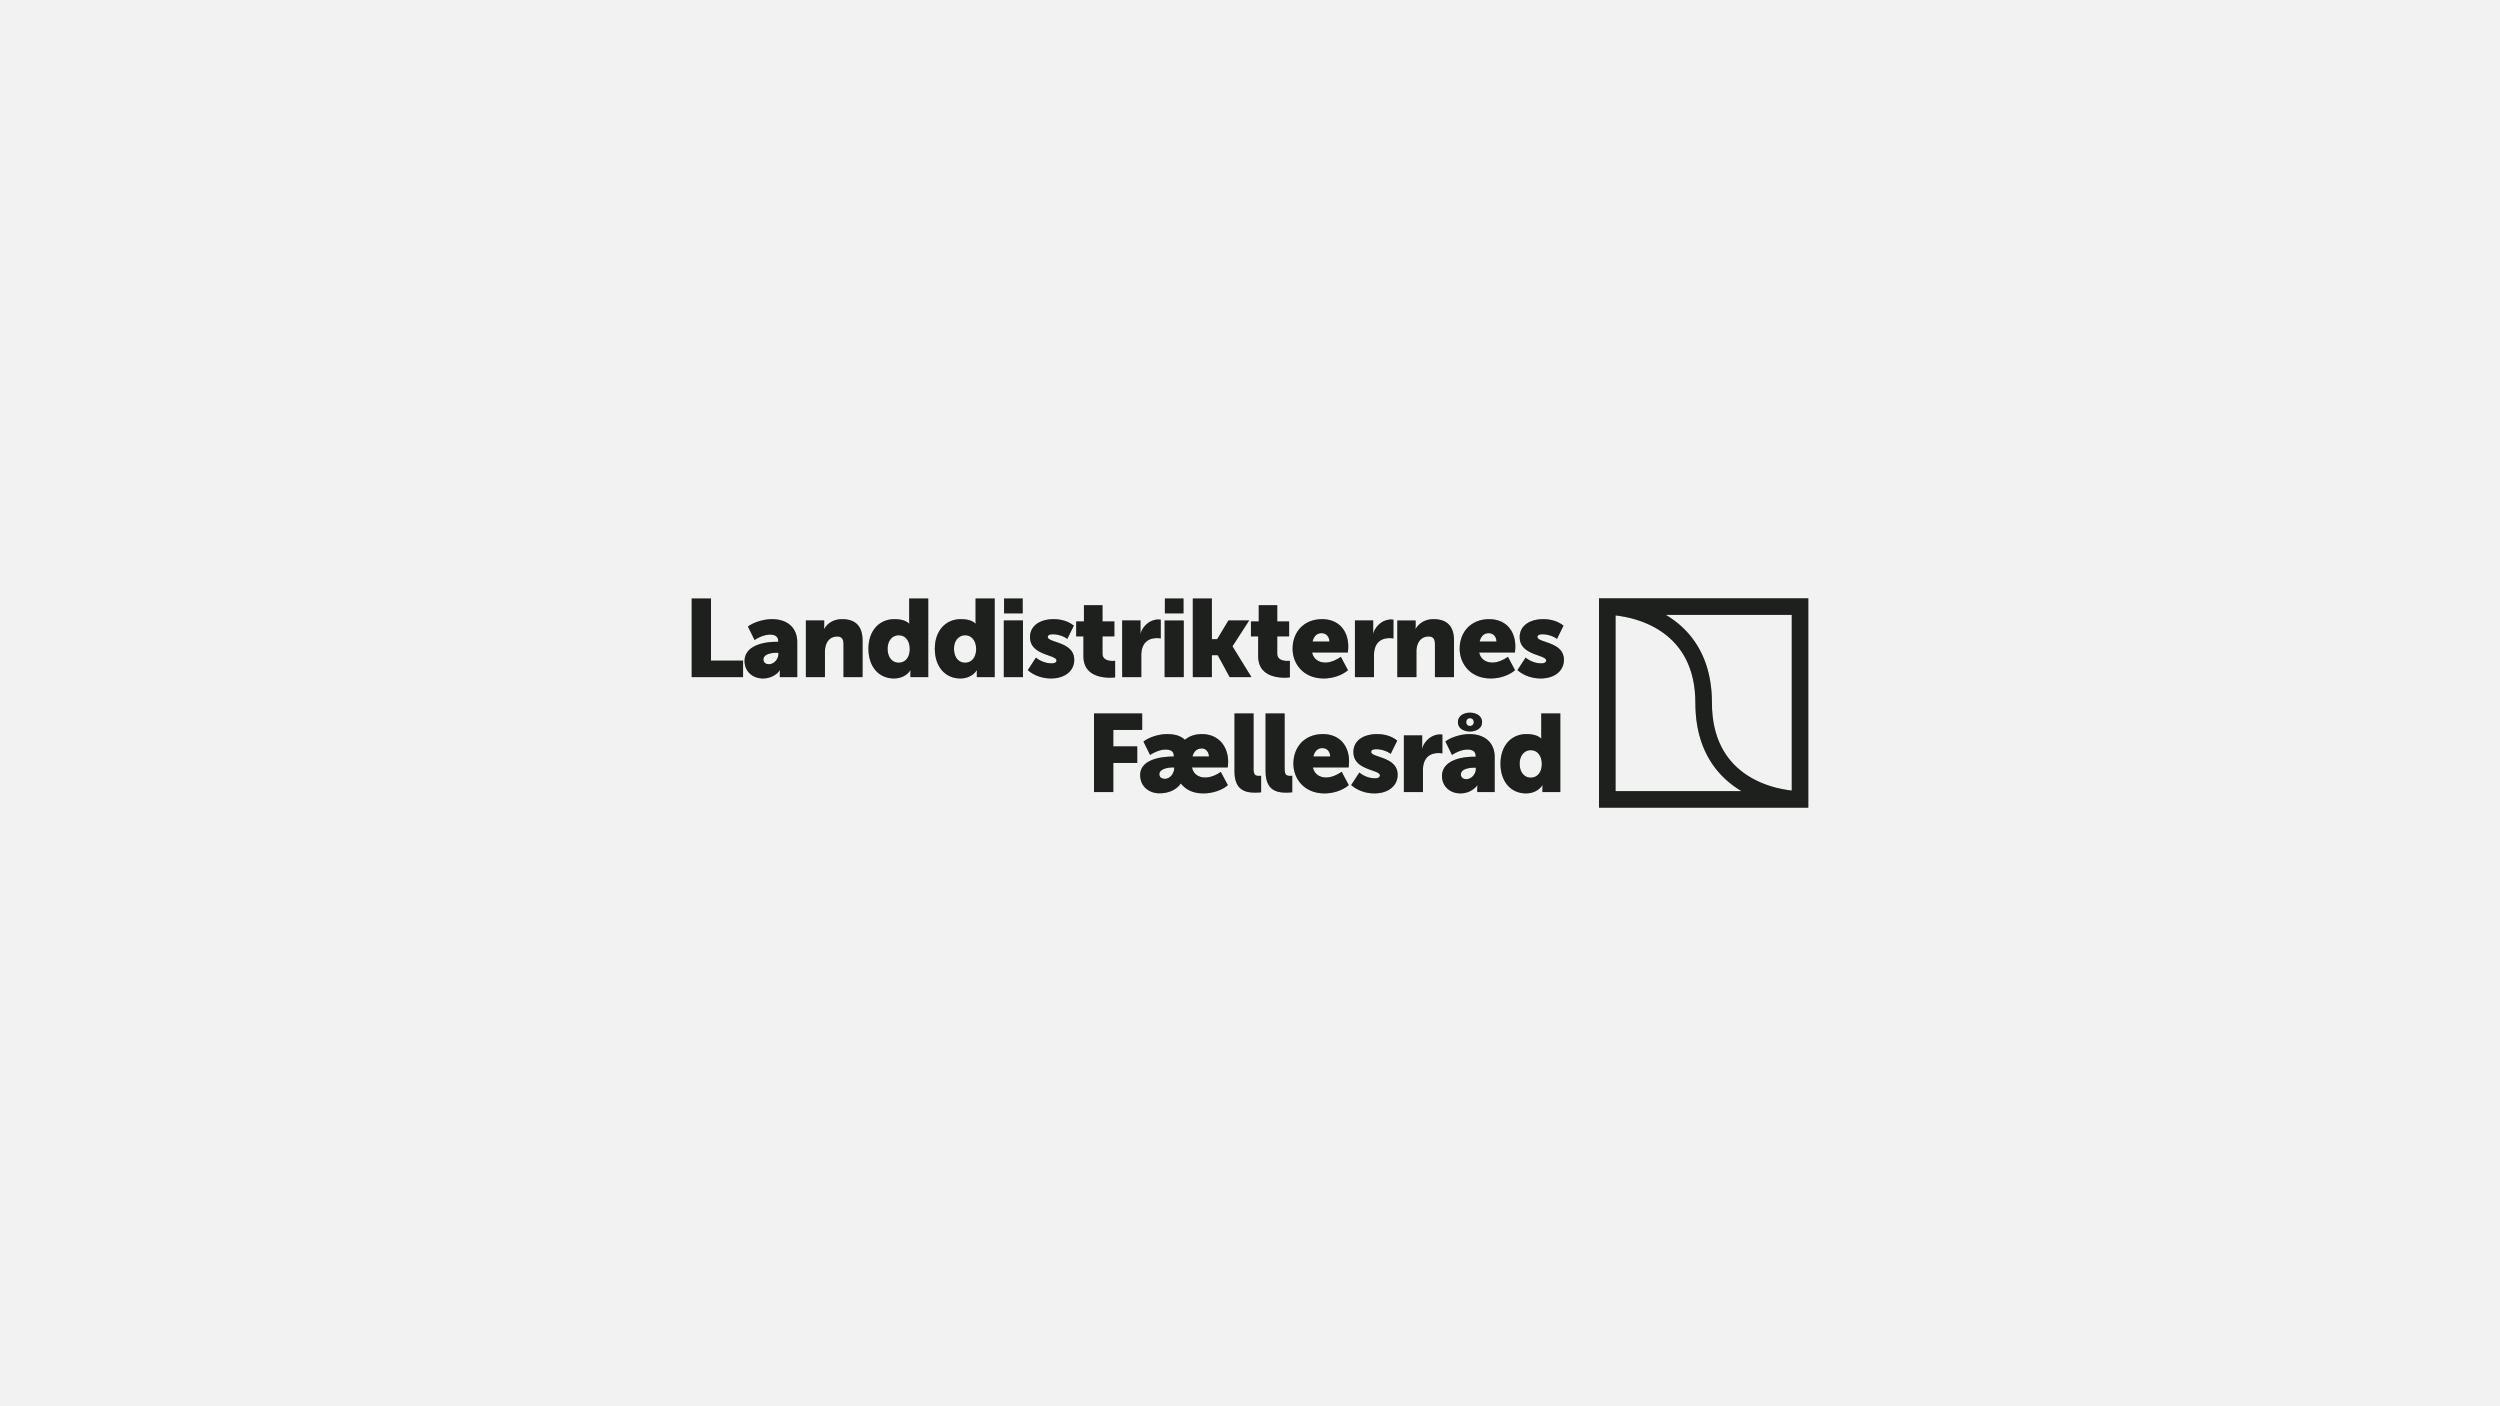 Logo_0001_Landdistrikternes_Faellesraad